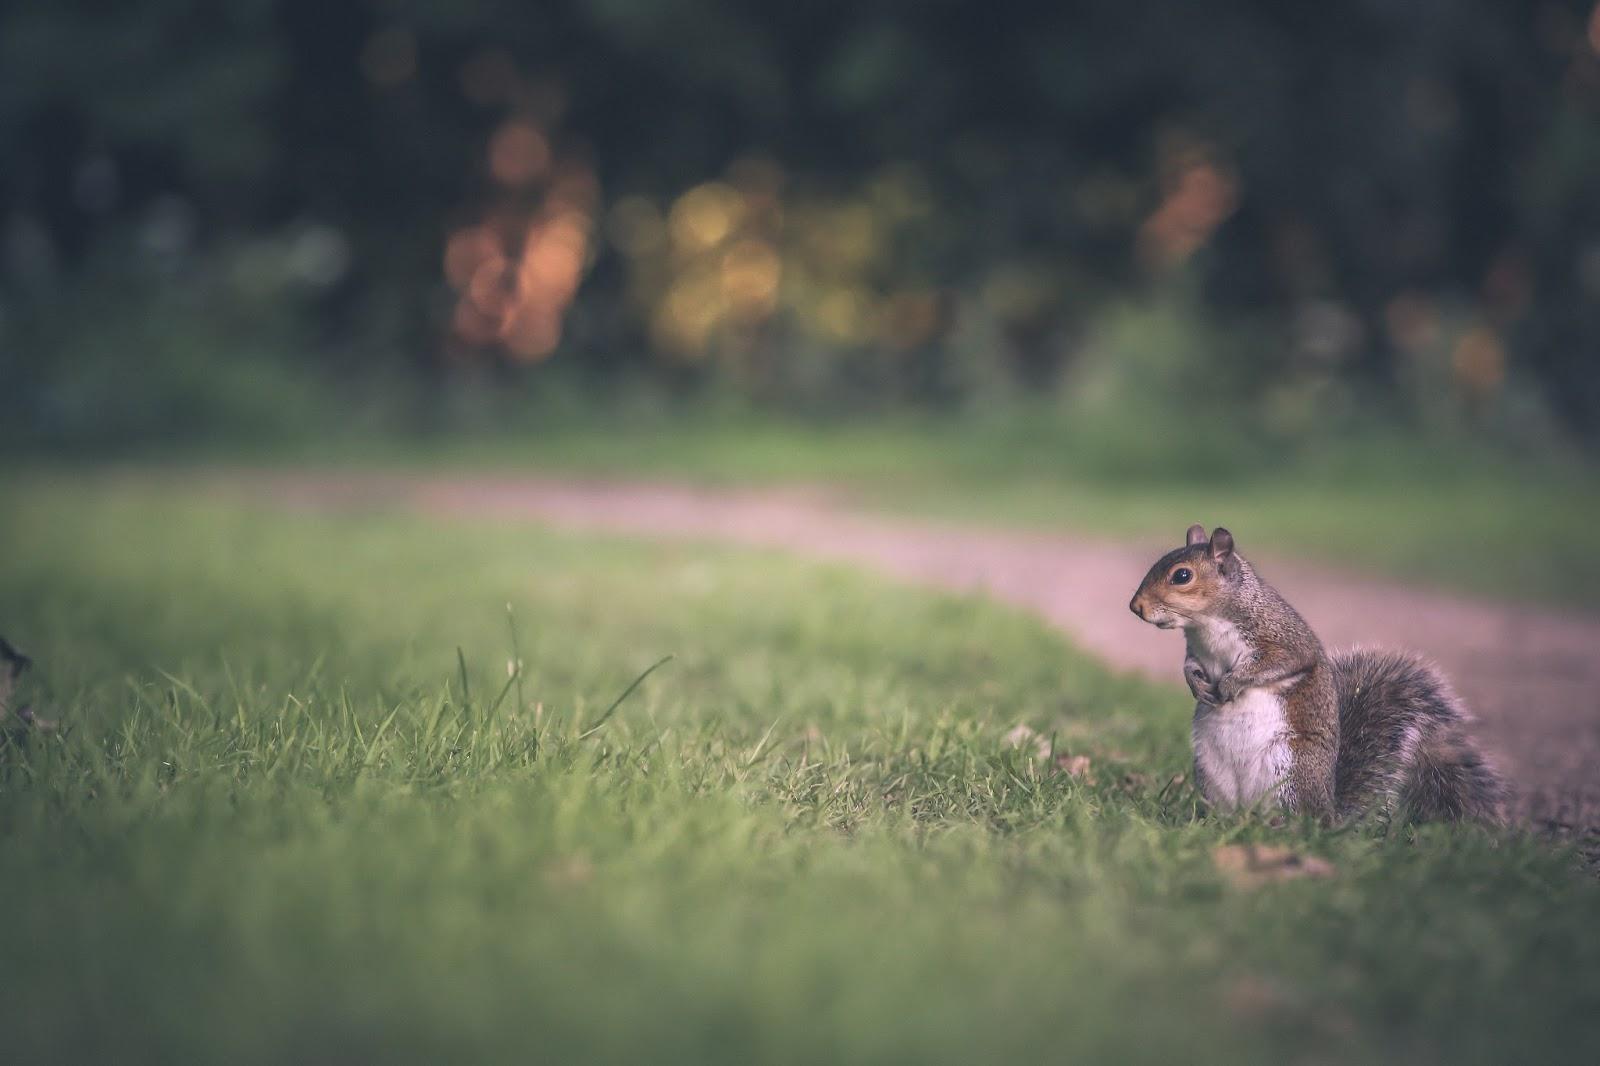 gray squirrel wallpaper - photo #30